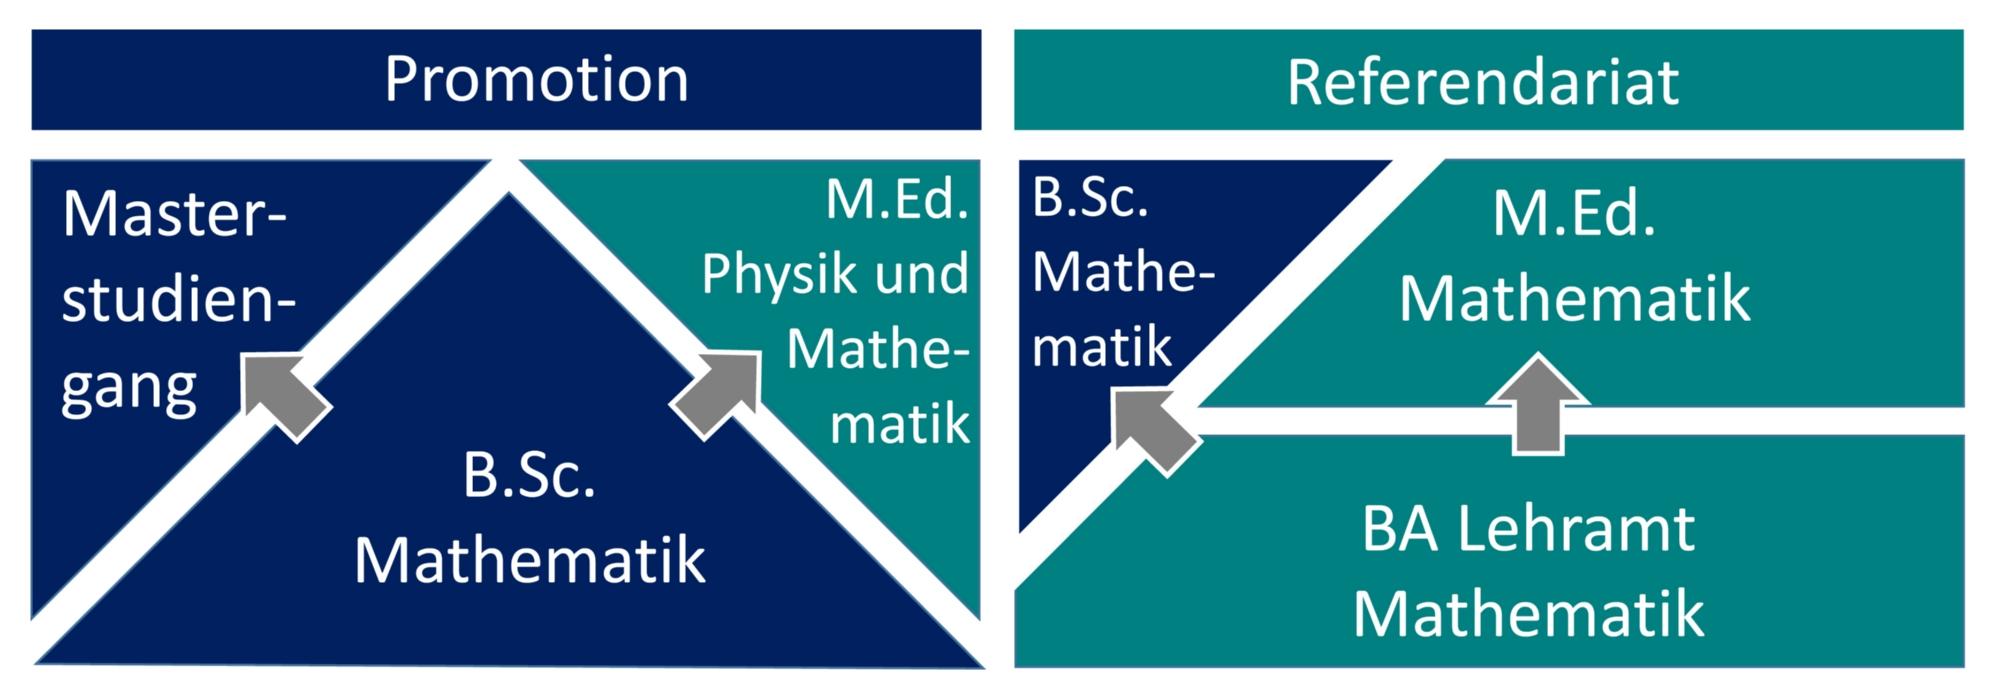 Makrostruktur Studiengänge Mathematik (c)